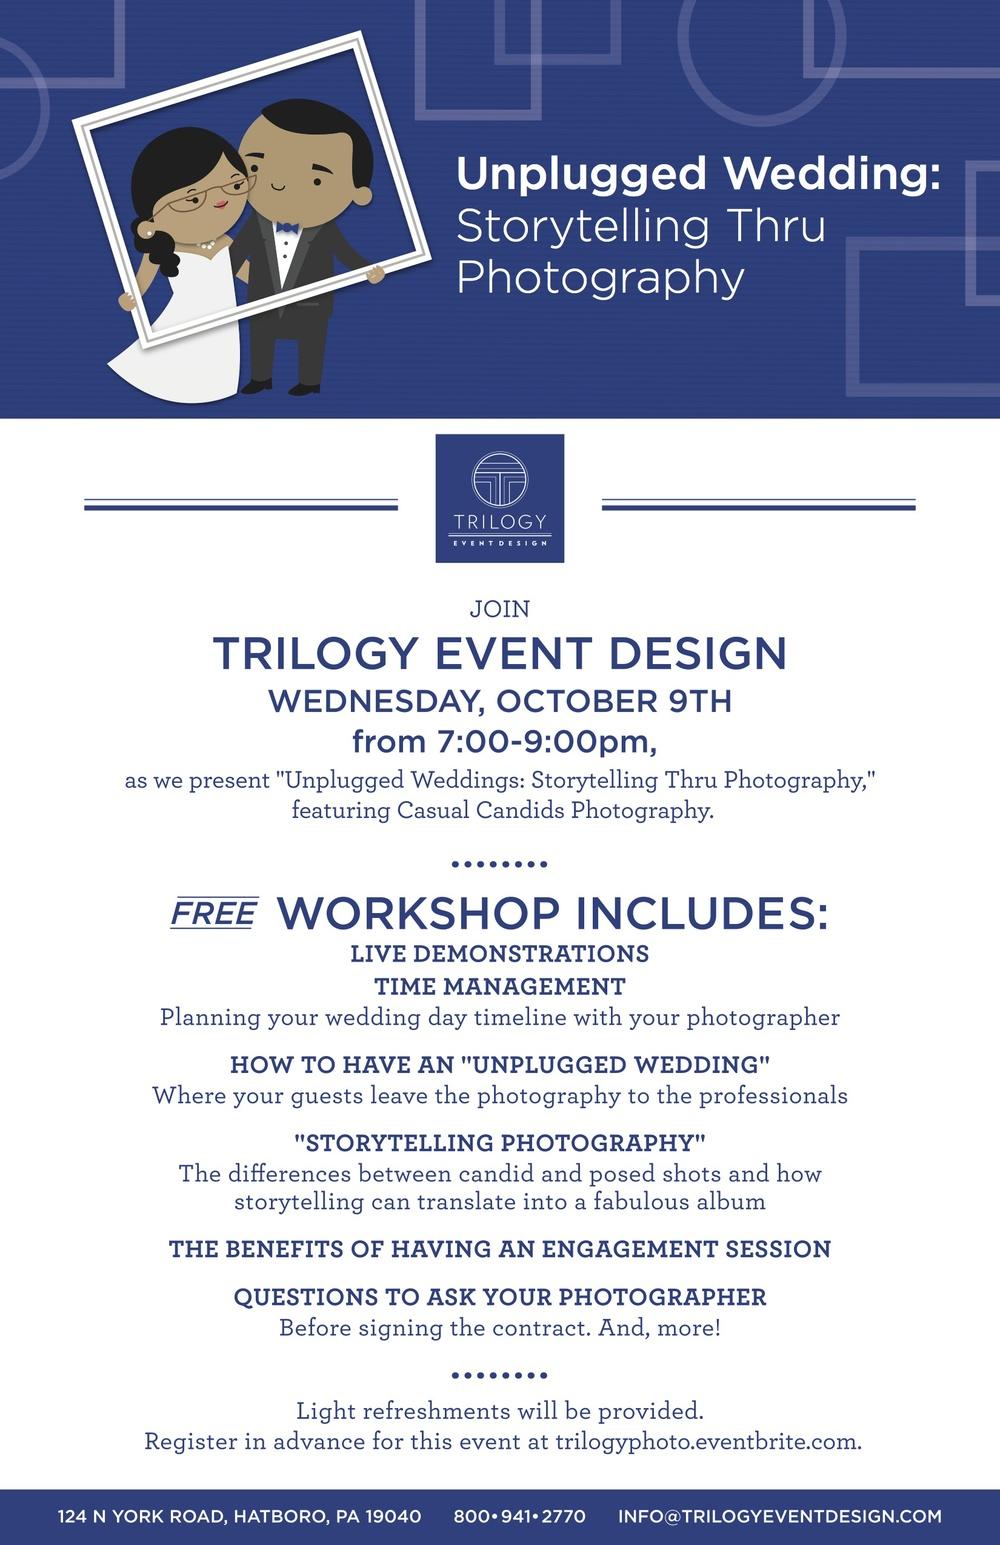 Trilogy_eventposter_photo.jpg